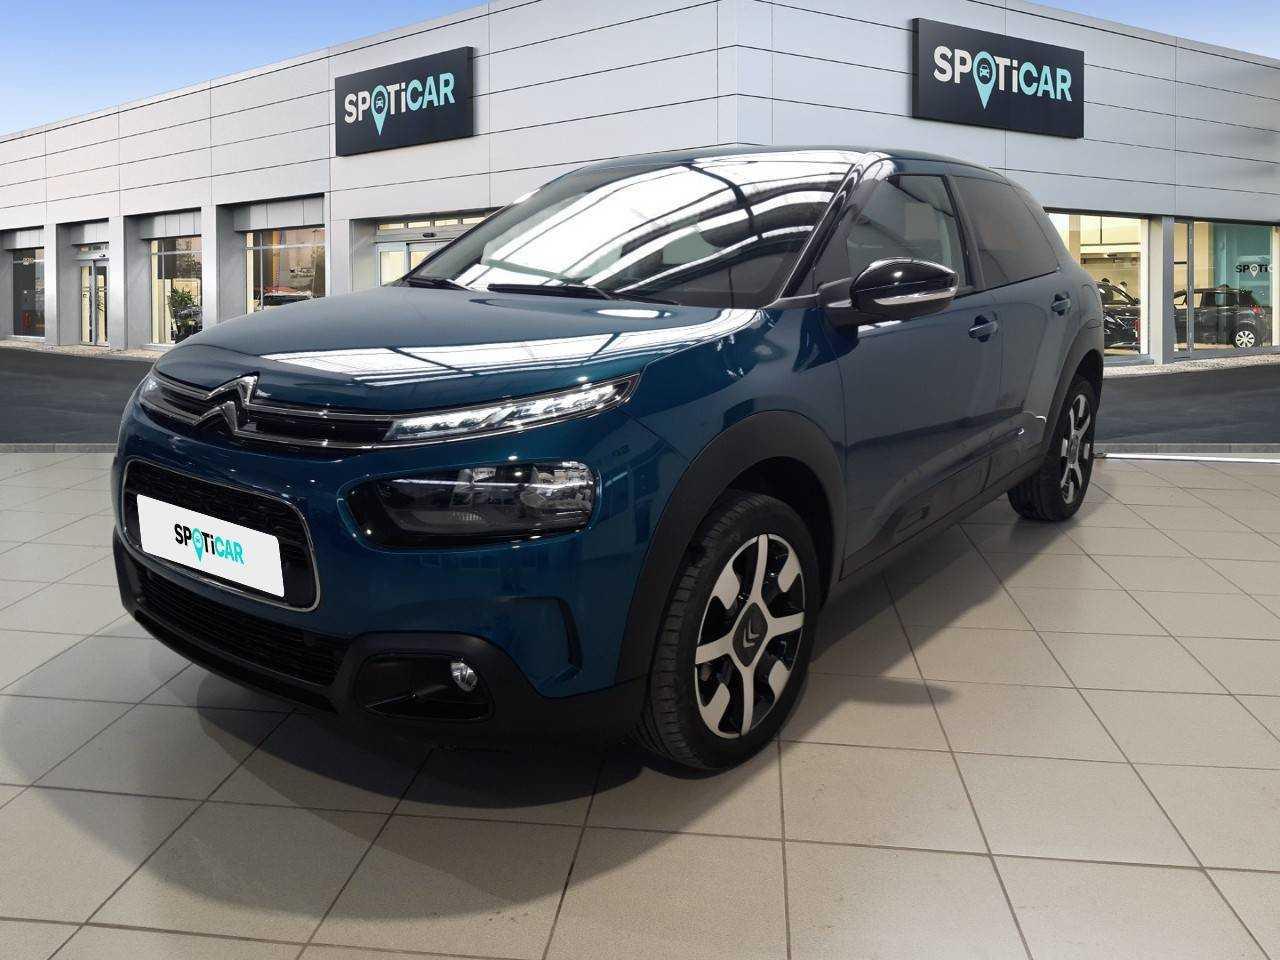 Citroën C4 Cactus ocasión segunda mano 2018 Diésel por 15.500€ en Baleares